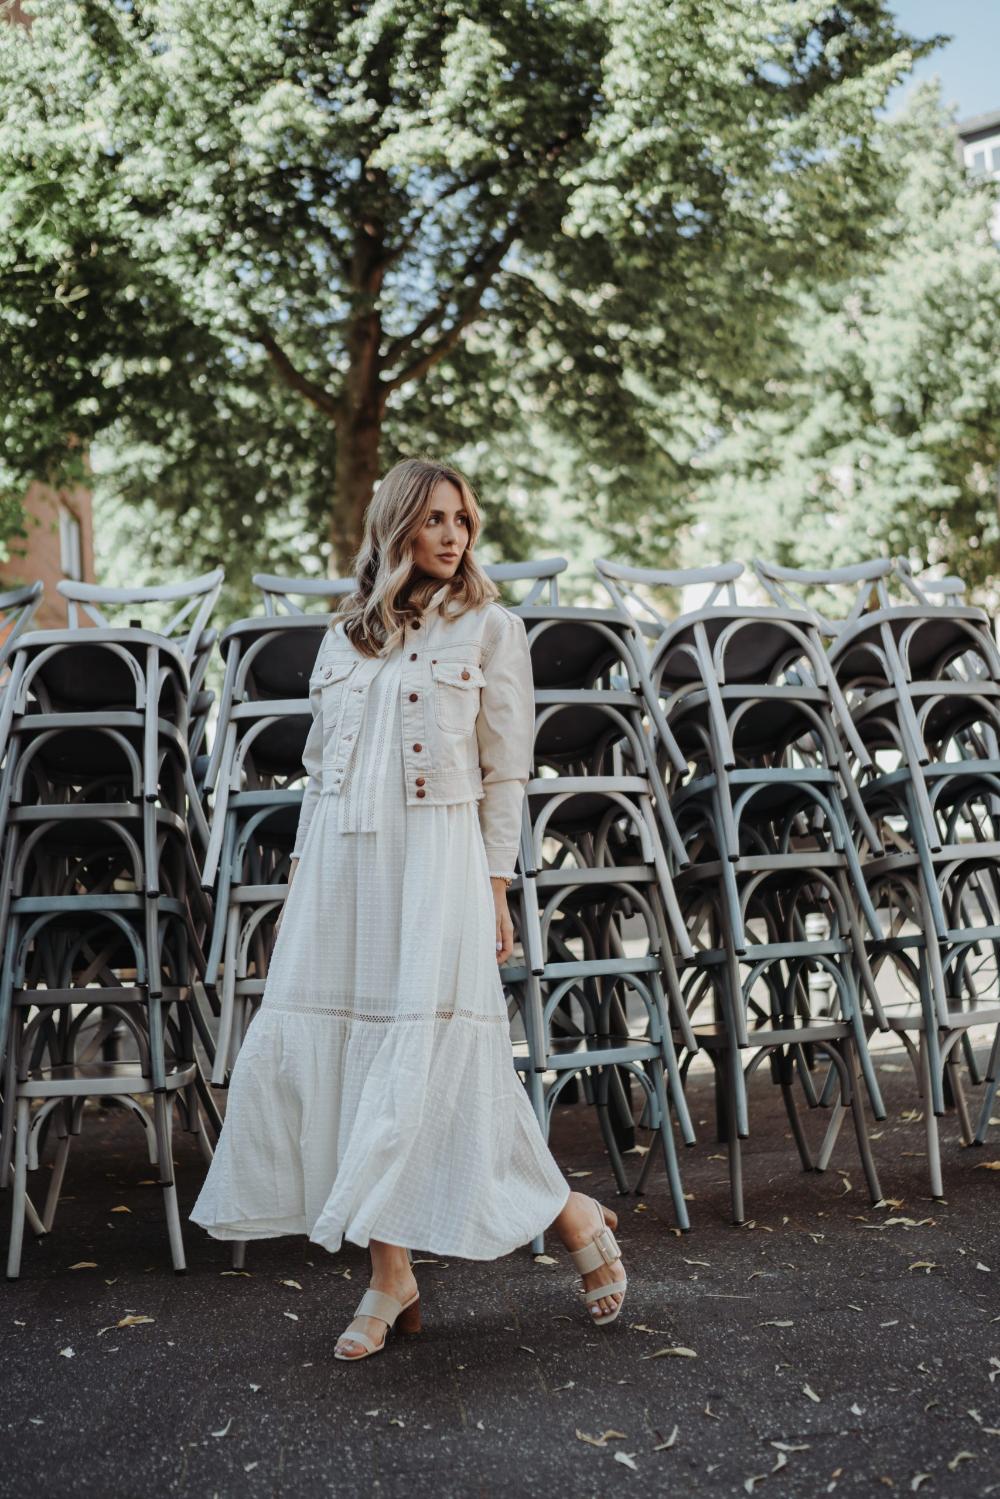 meine sommer 2020 looks im amazon fashion sale – carmushka